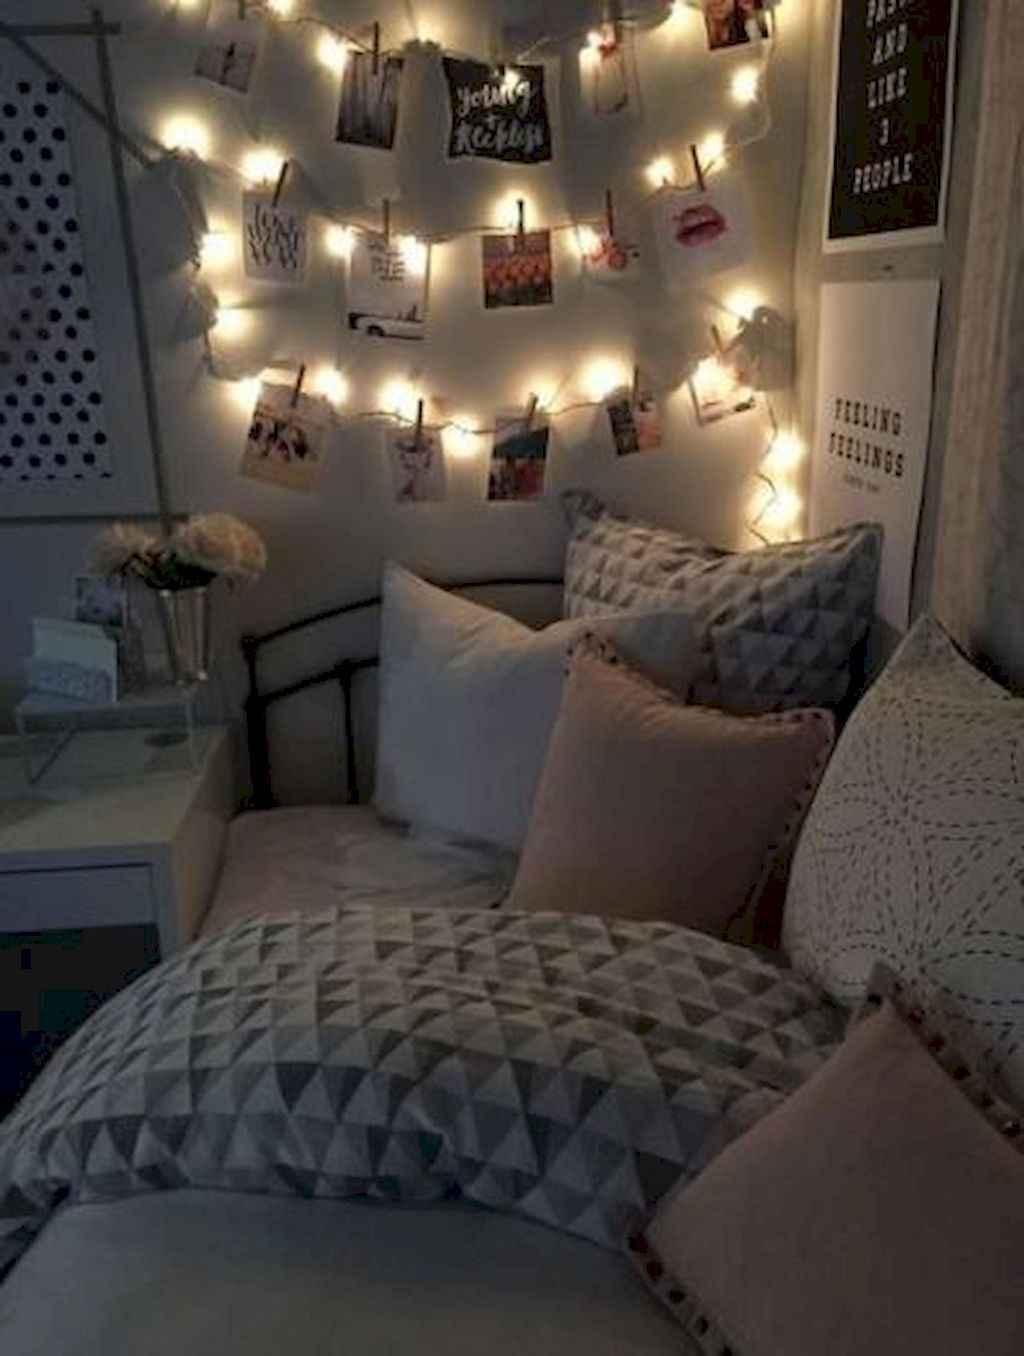 Cute diy dorm room decorating ideas on a budget (47)